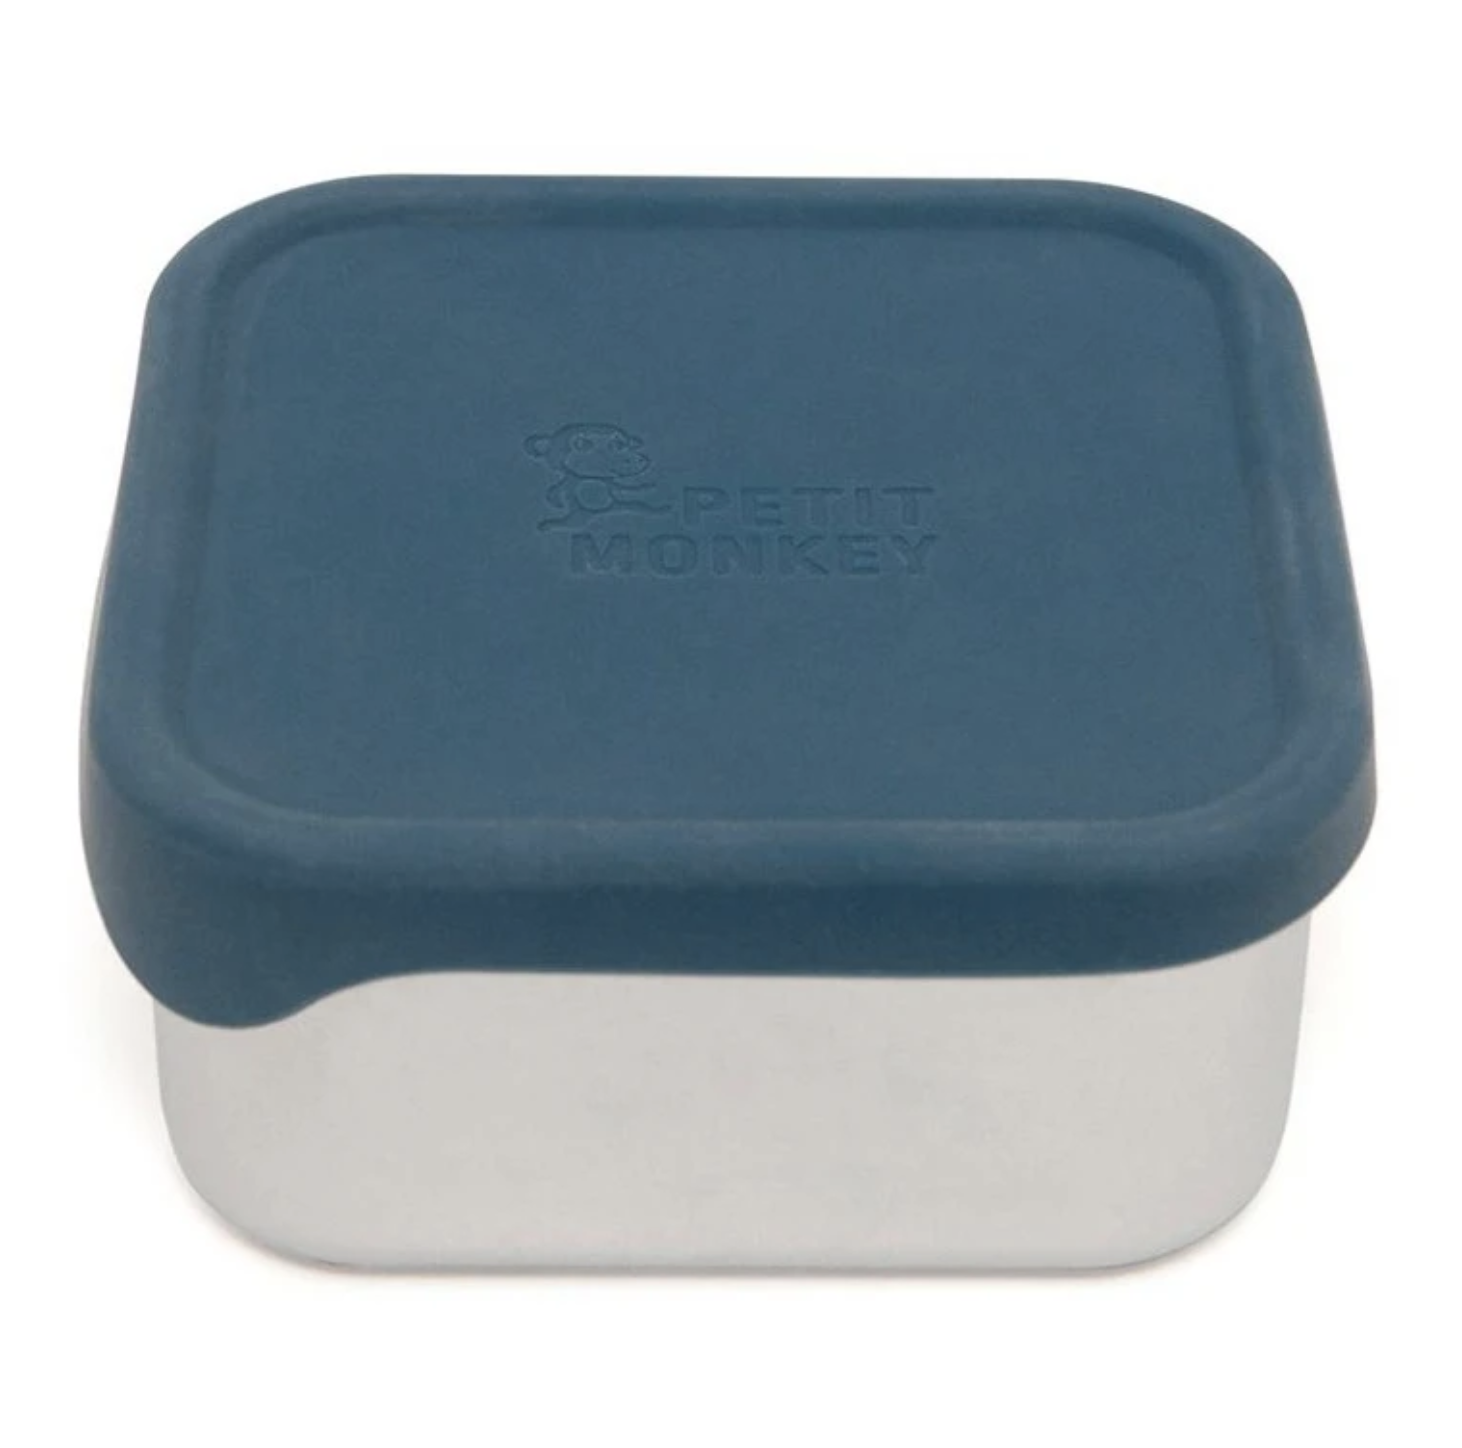 Lunchbox Lucy - Balsam Blue - Petit Monkey-1